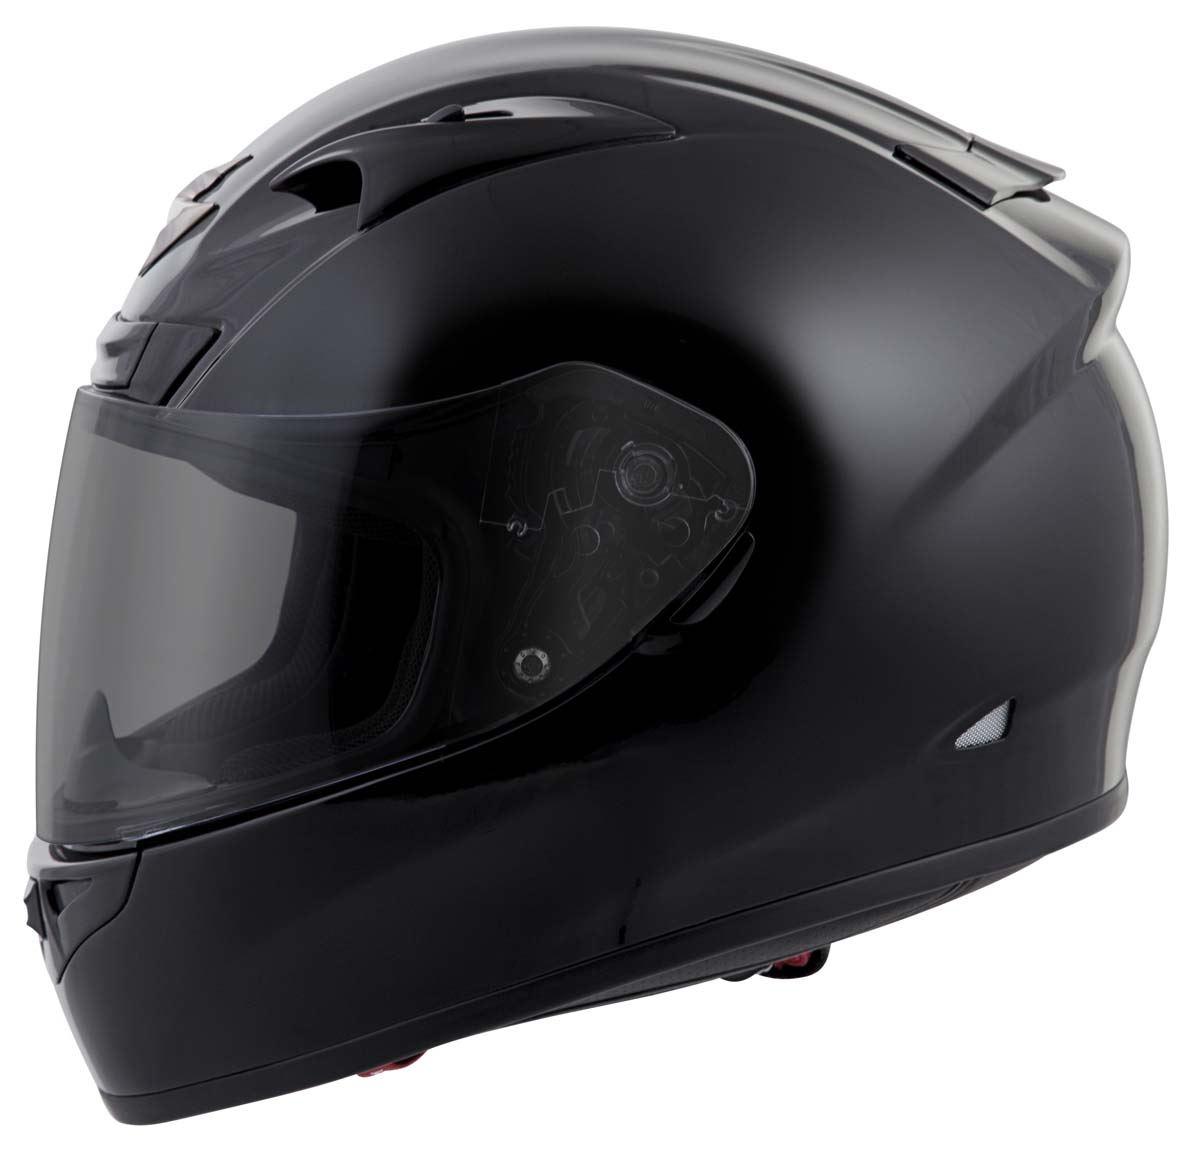 Scorpion-EXO-R710-Helmet-Fiberglass-Full-Face-DOT-SNELL-M2015-Certified-XS-2XL miniature 6